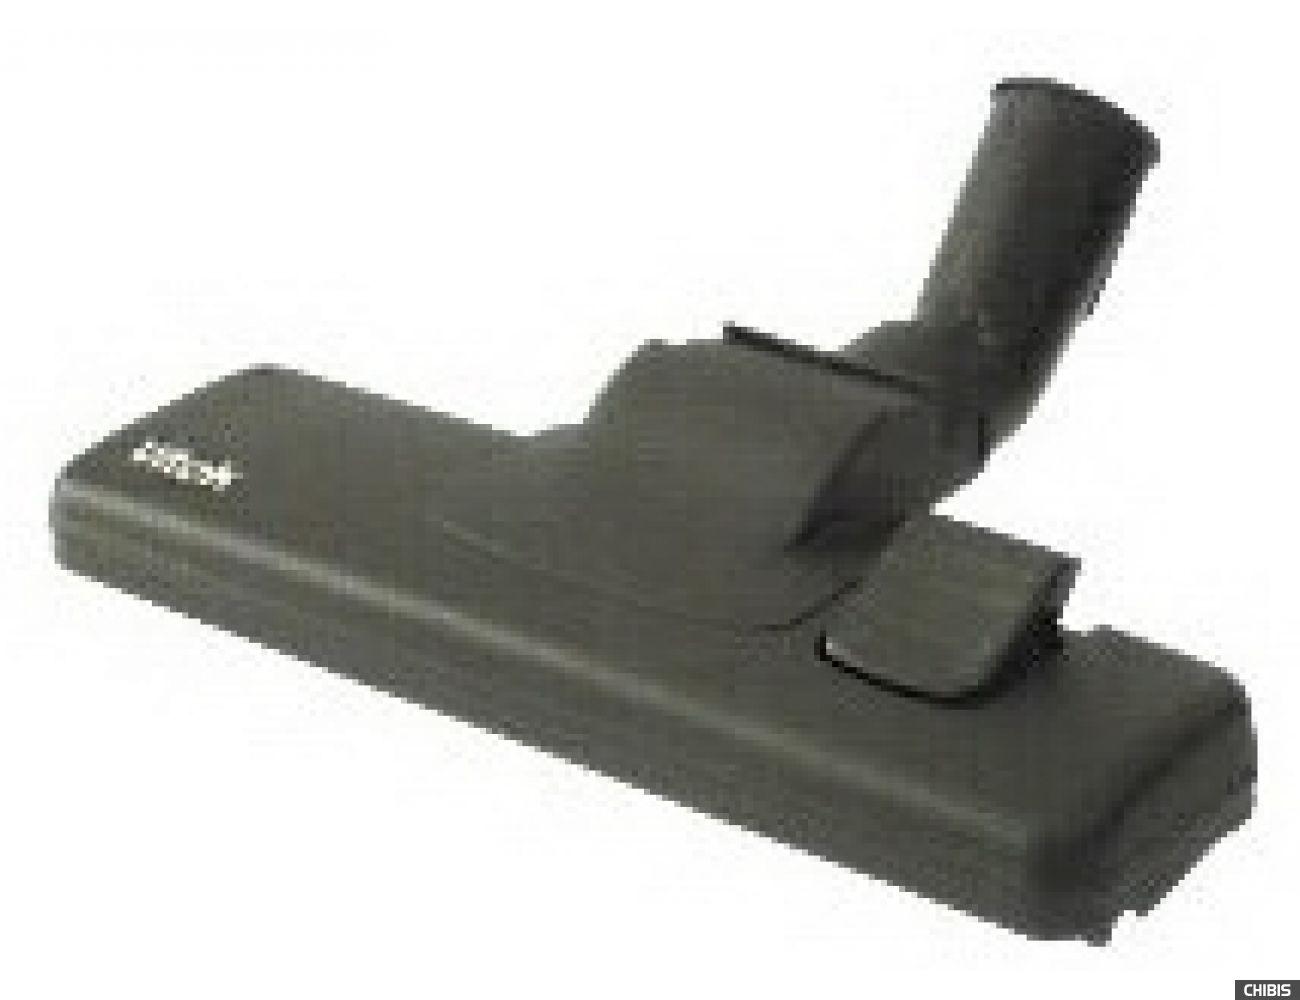 Щетка для пылесоса Vitek VT-1881 (32 мм.)